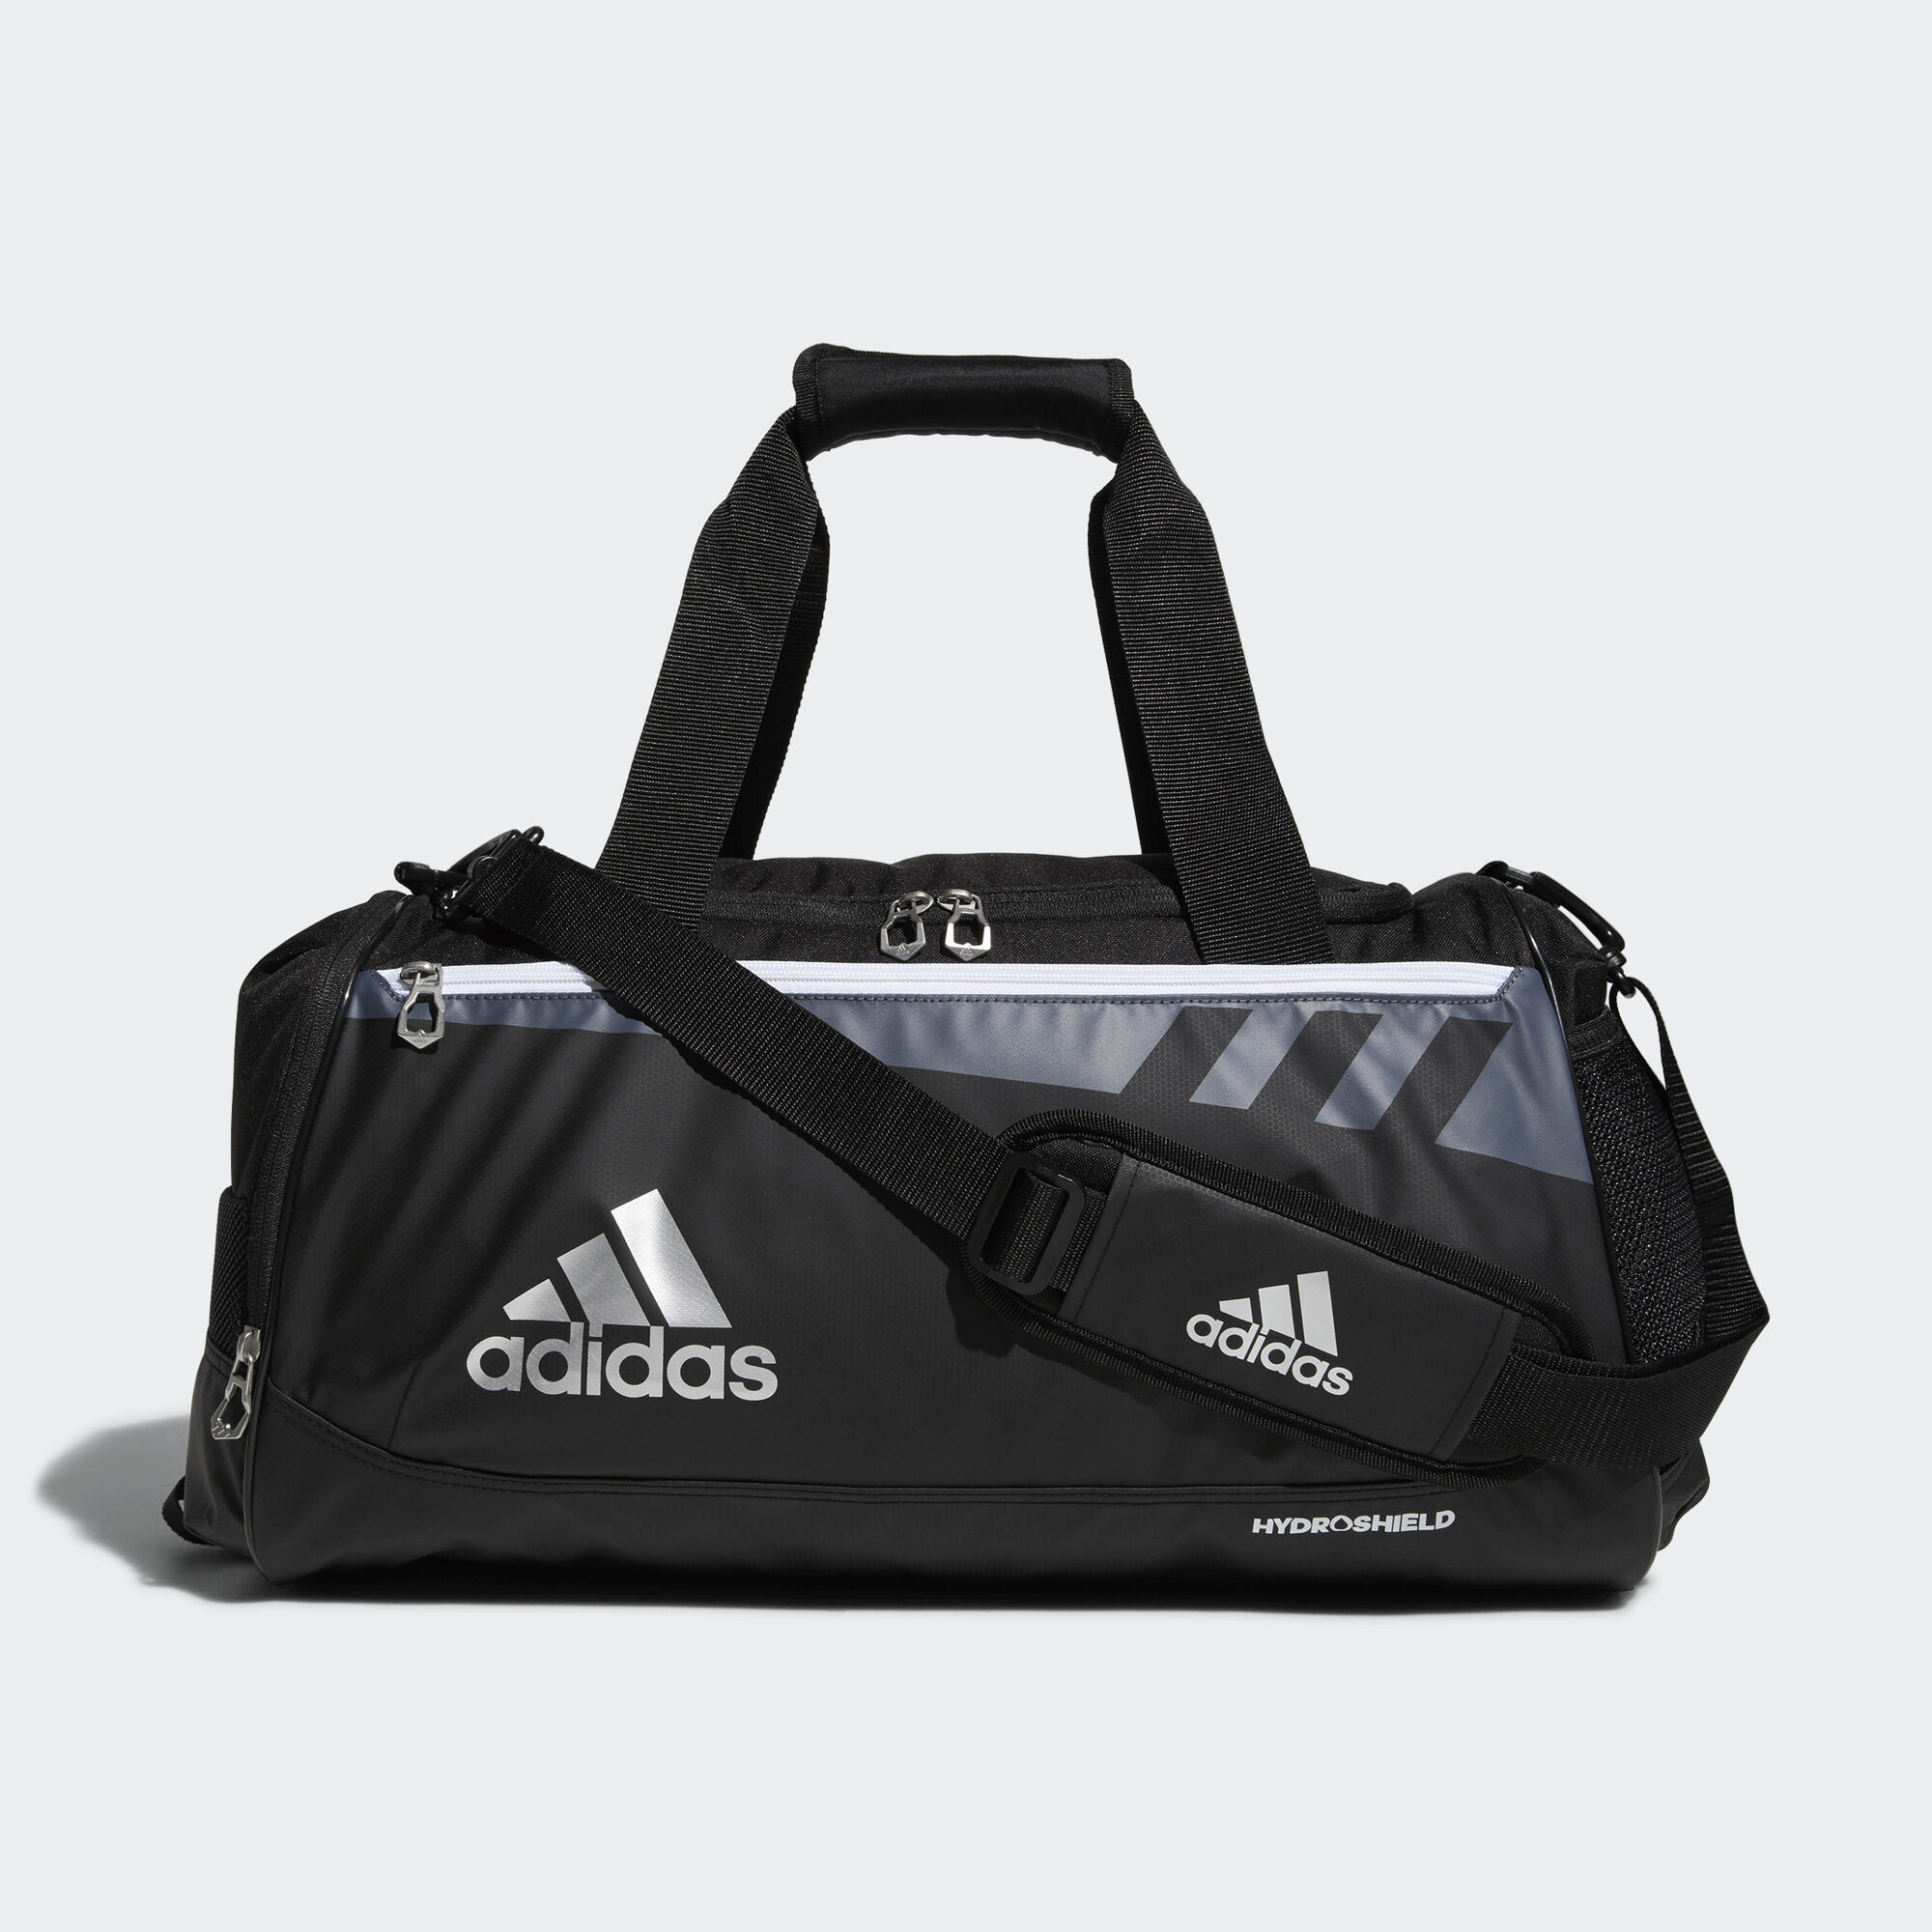 Buy small adidas duffle bag   OFF67% Discounted cd3d27fe3db65